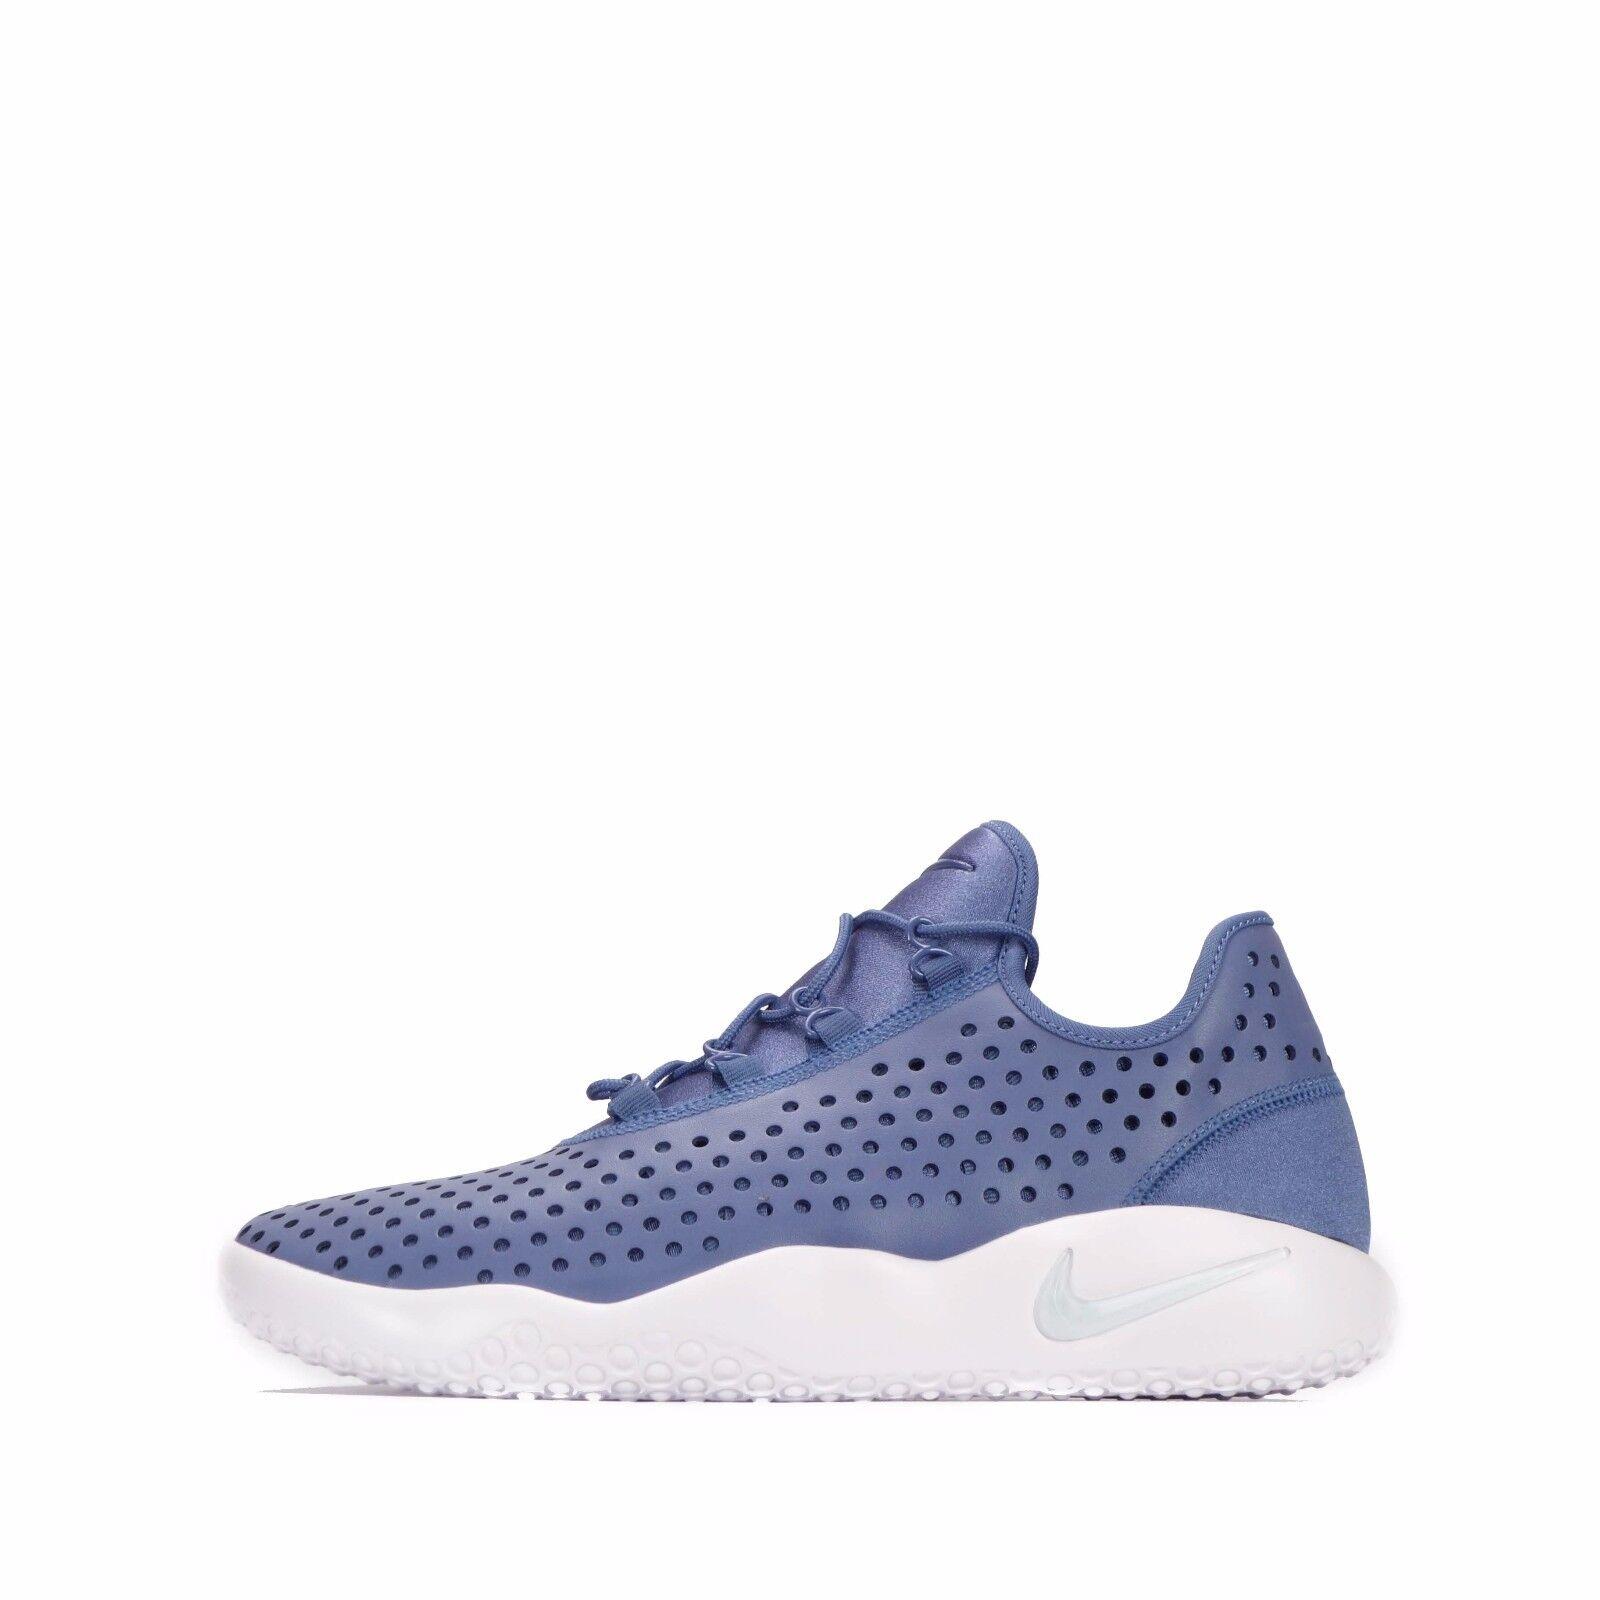 Nike FL-Rue Chaussures Hommes lune bleue blanc